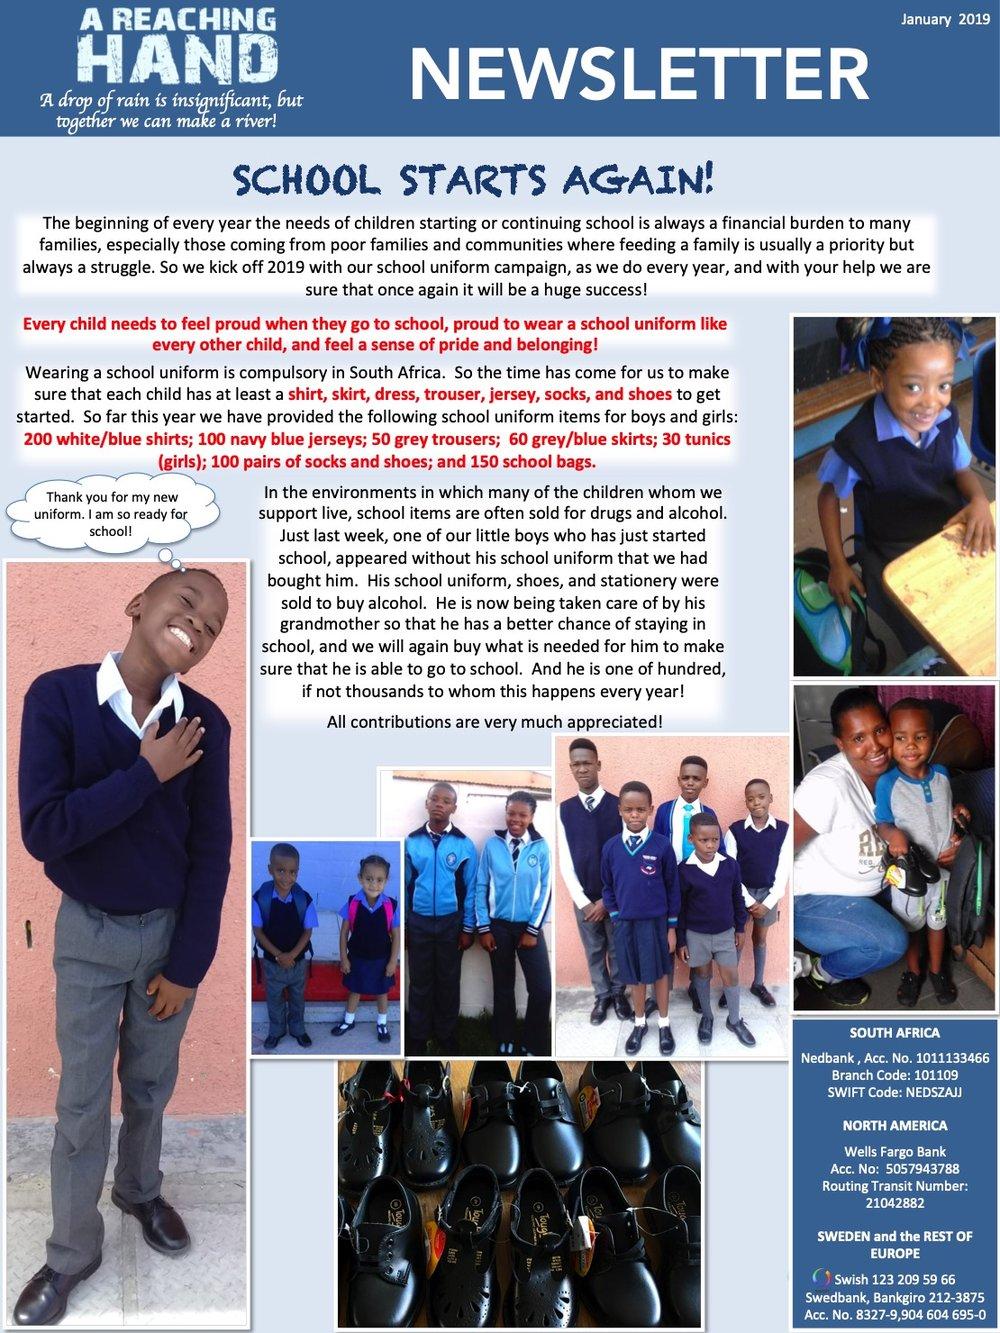 ARH English Newsletter School Starts 2019 P1.jpg